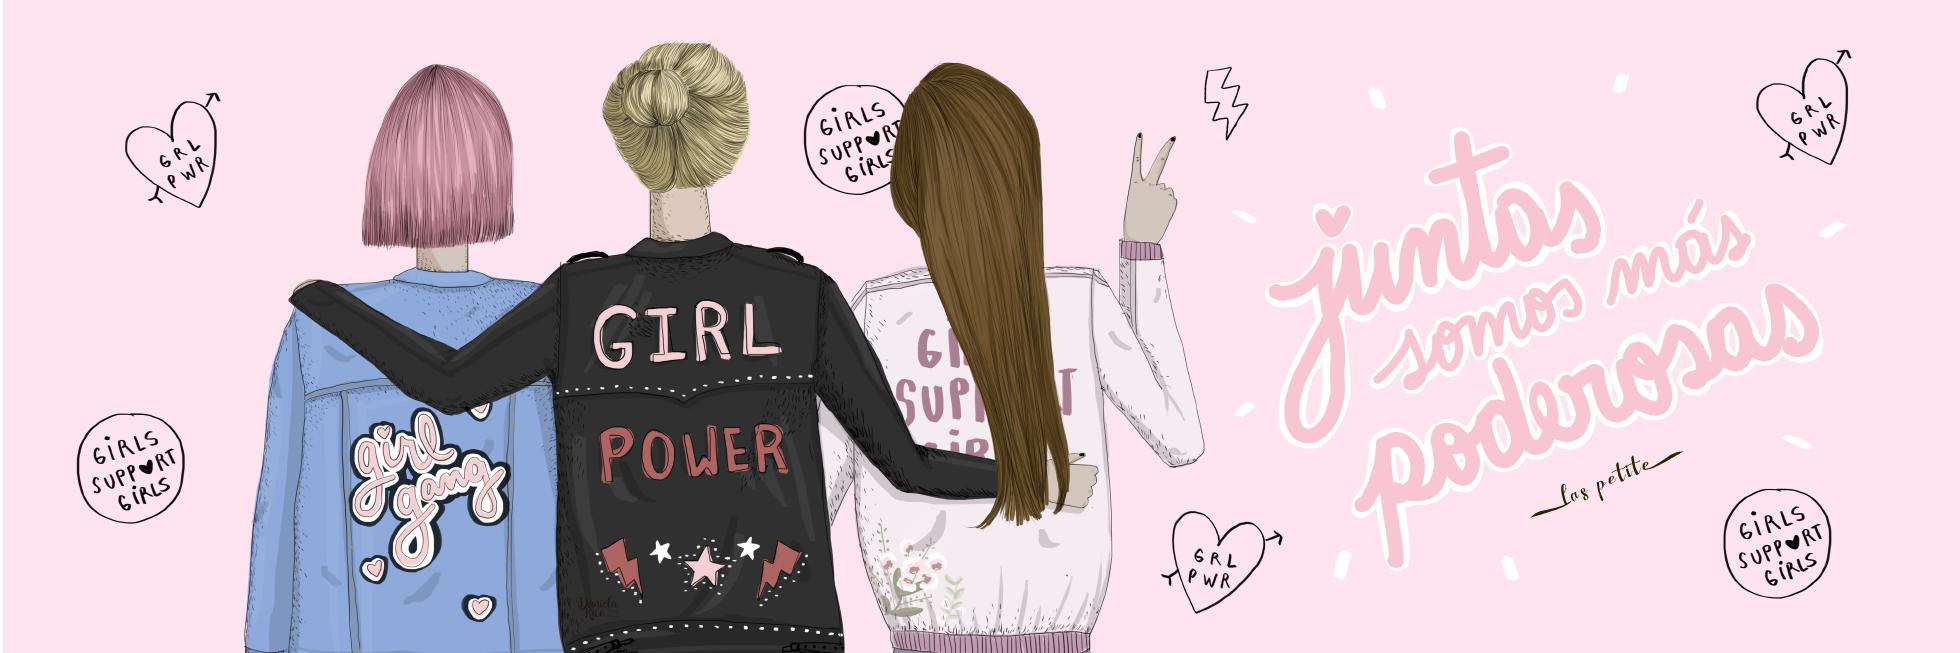 girls_support_girls